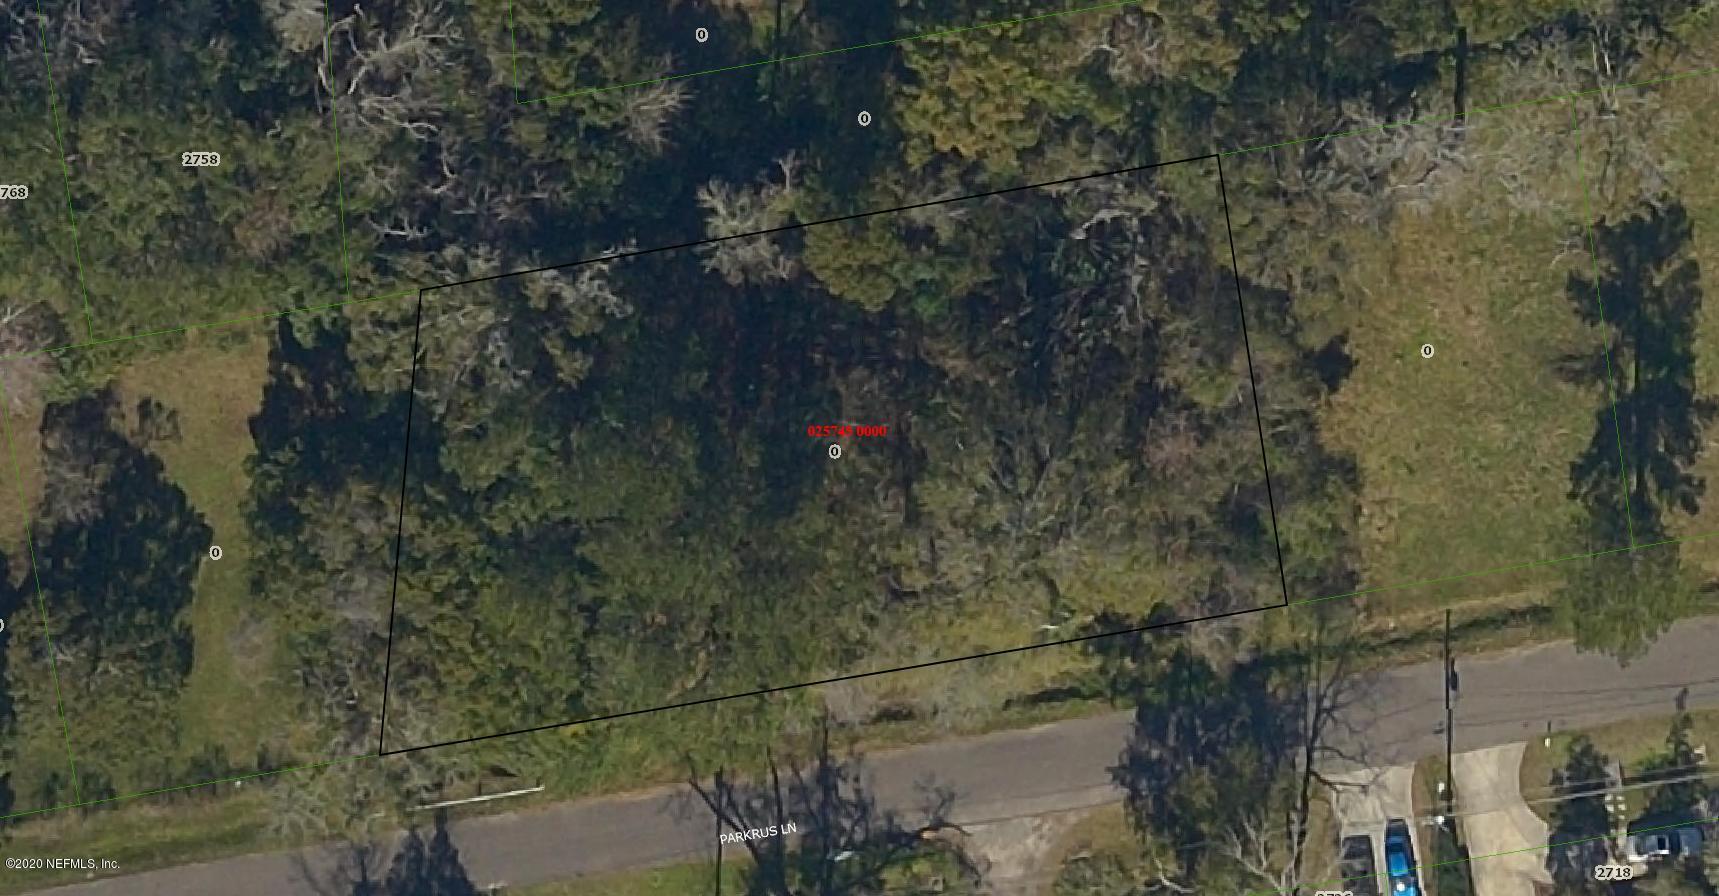 0 PARKRUS, JACKSONVILLE, FLORIDA 32208, ,Vacant land,For sale,PARKRUS,1046089